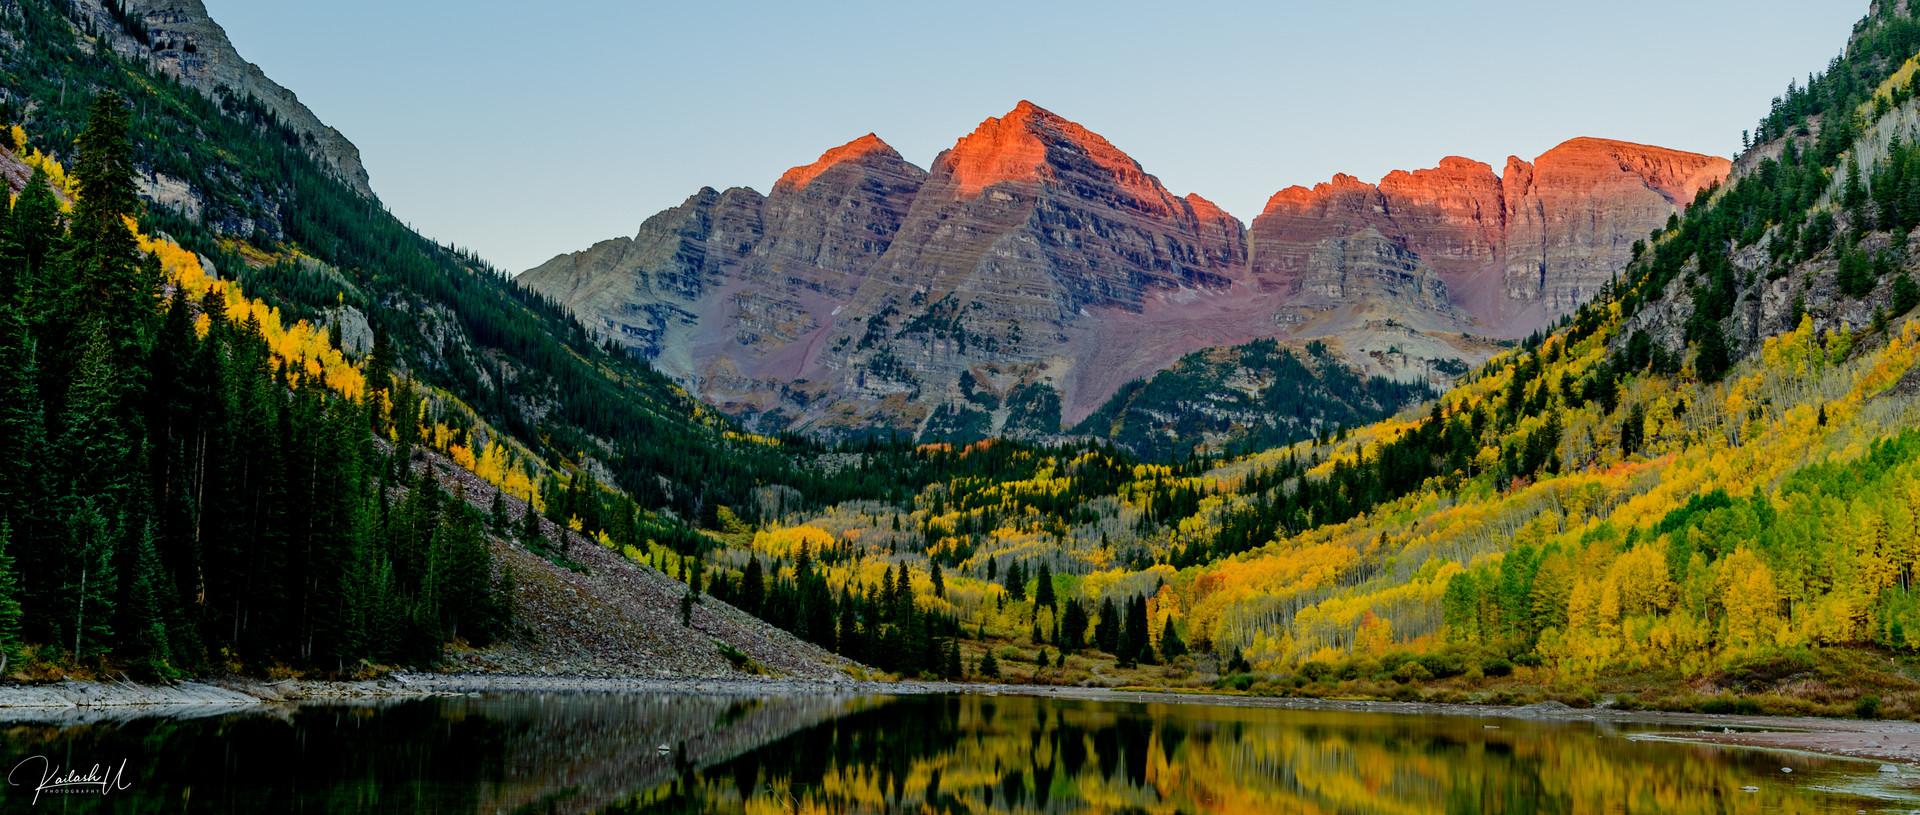 The Iconic Maroon Bells, Aspen